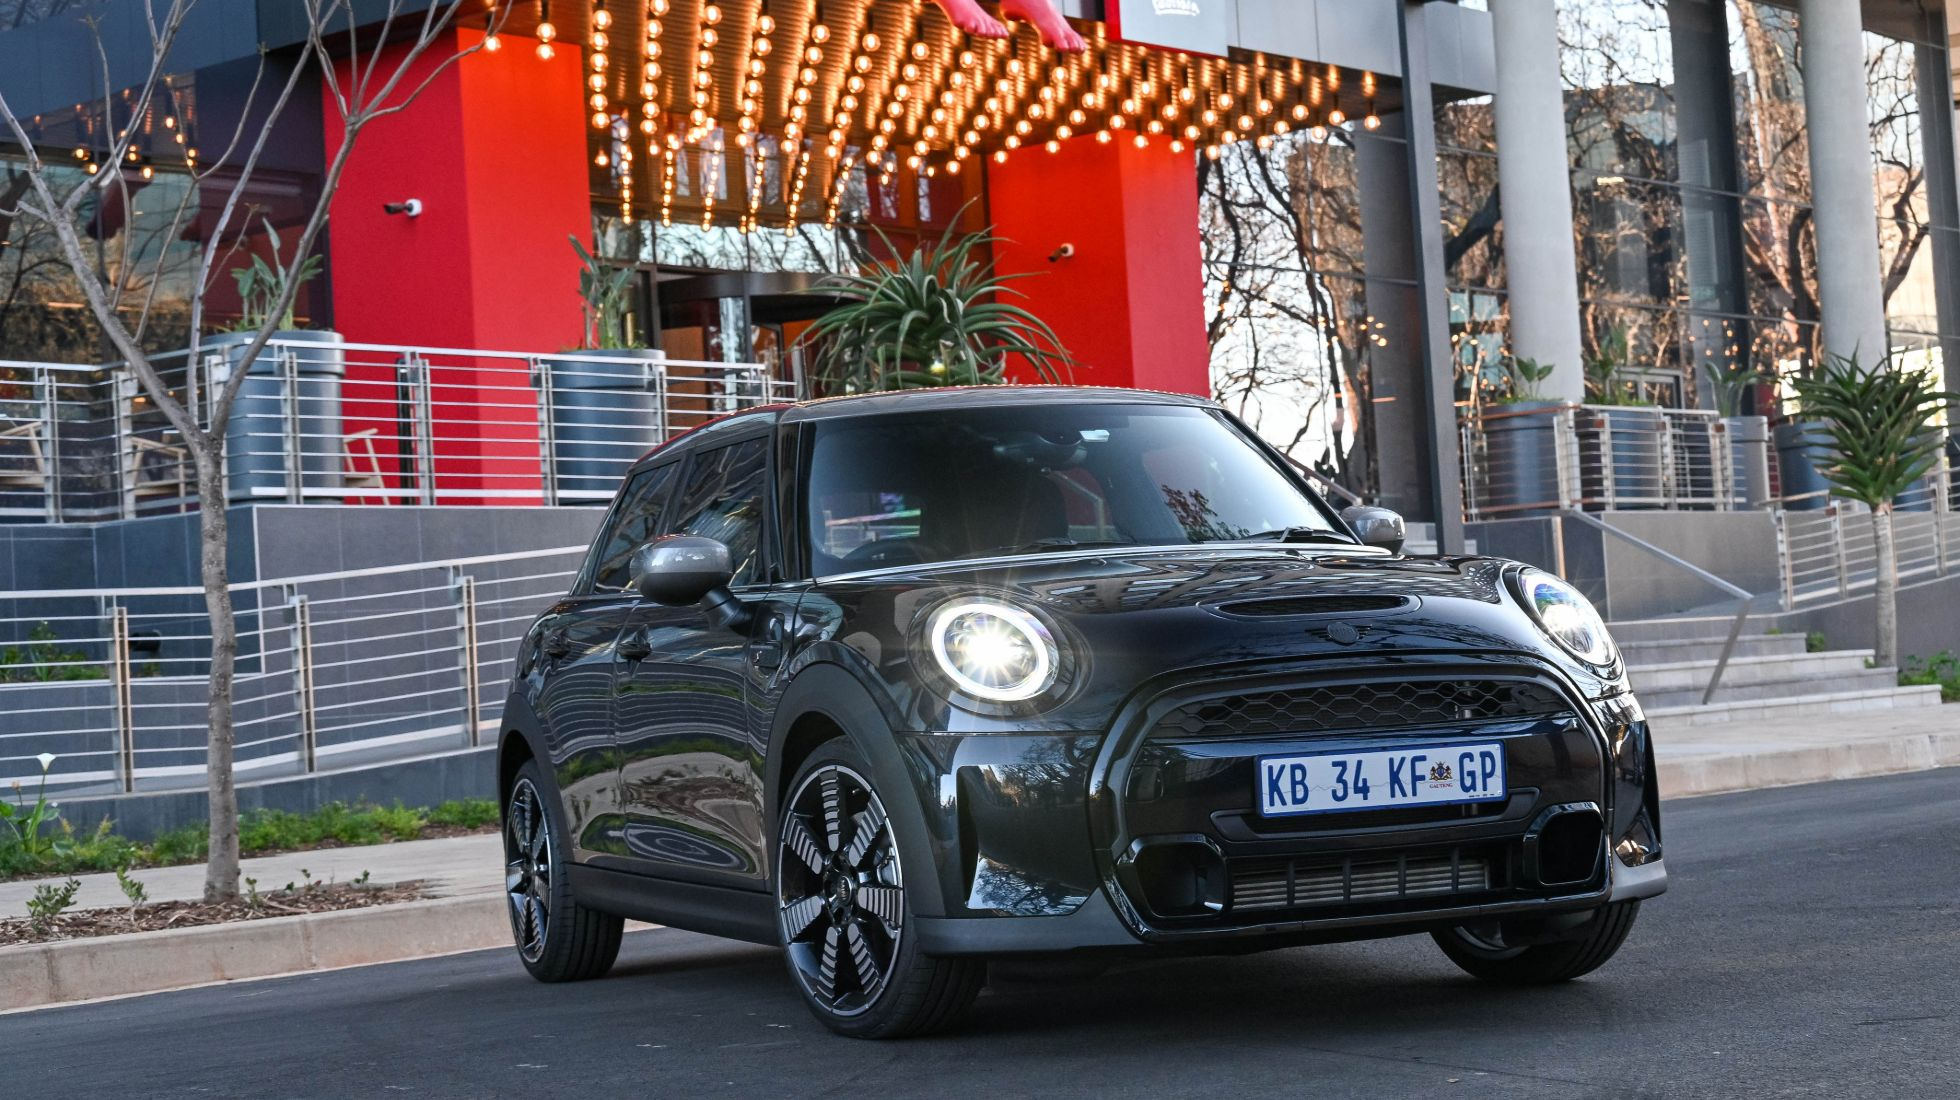 First drive: Still Mini but bigger on styling